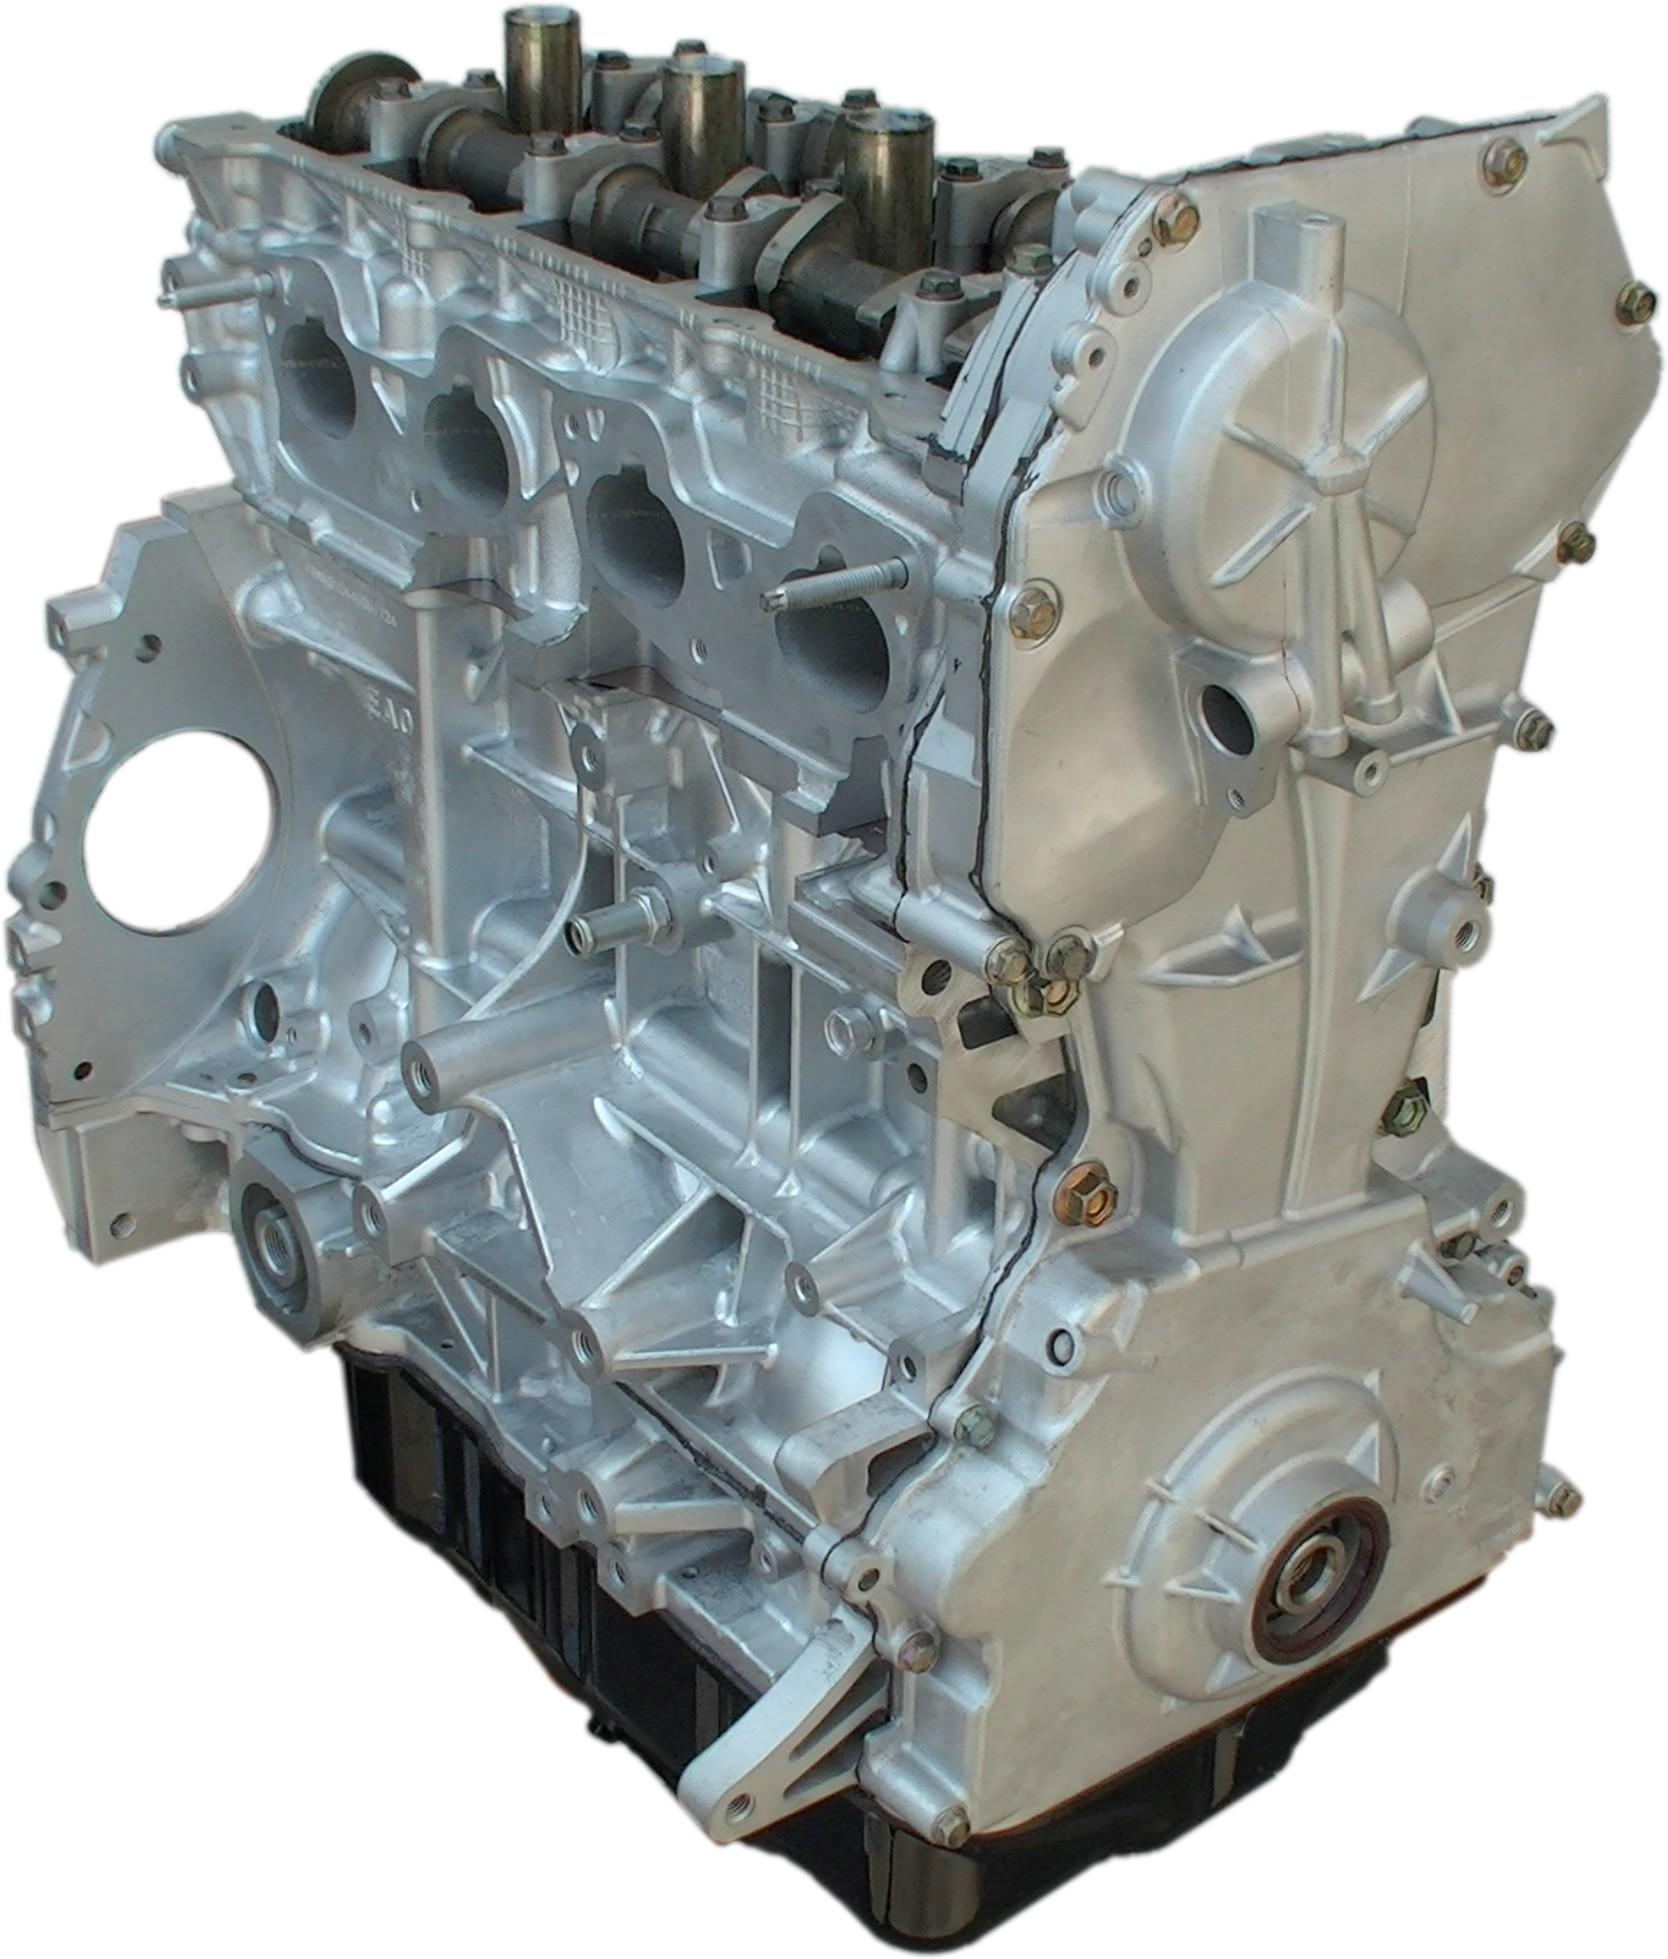 nissan 2 5 engine diagram 3 phase forward and reverse wiring rebuilt 2005 2012 frontier 5l qr25de  kar